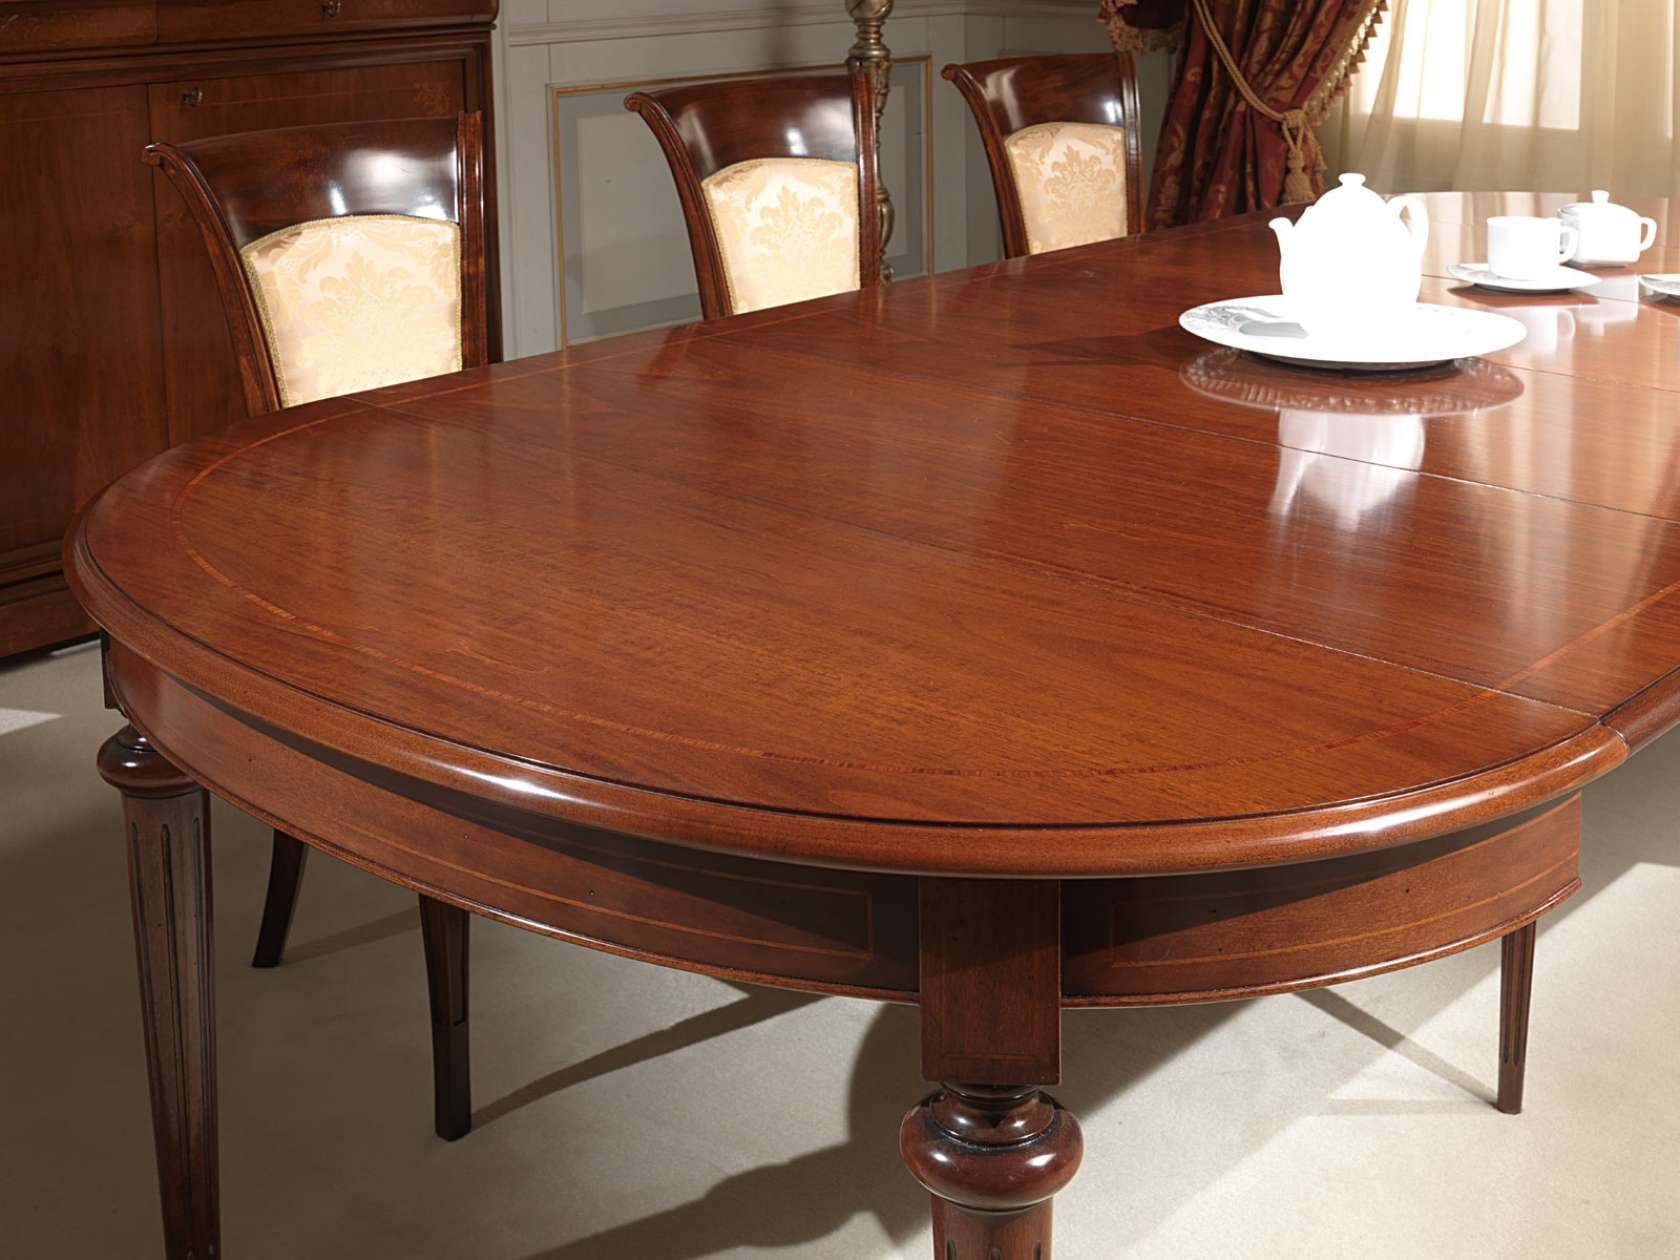 Tavolo ovale allungabile in noce | Vimercati Meda